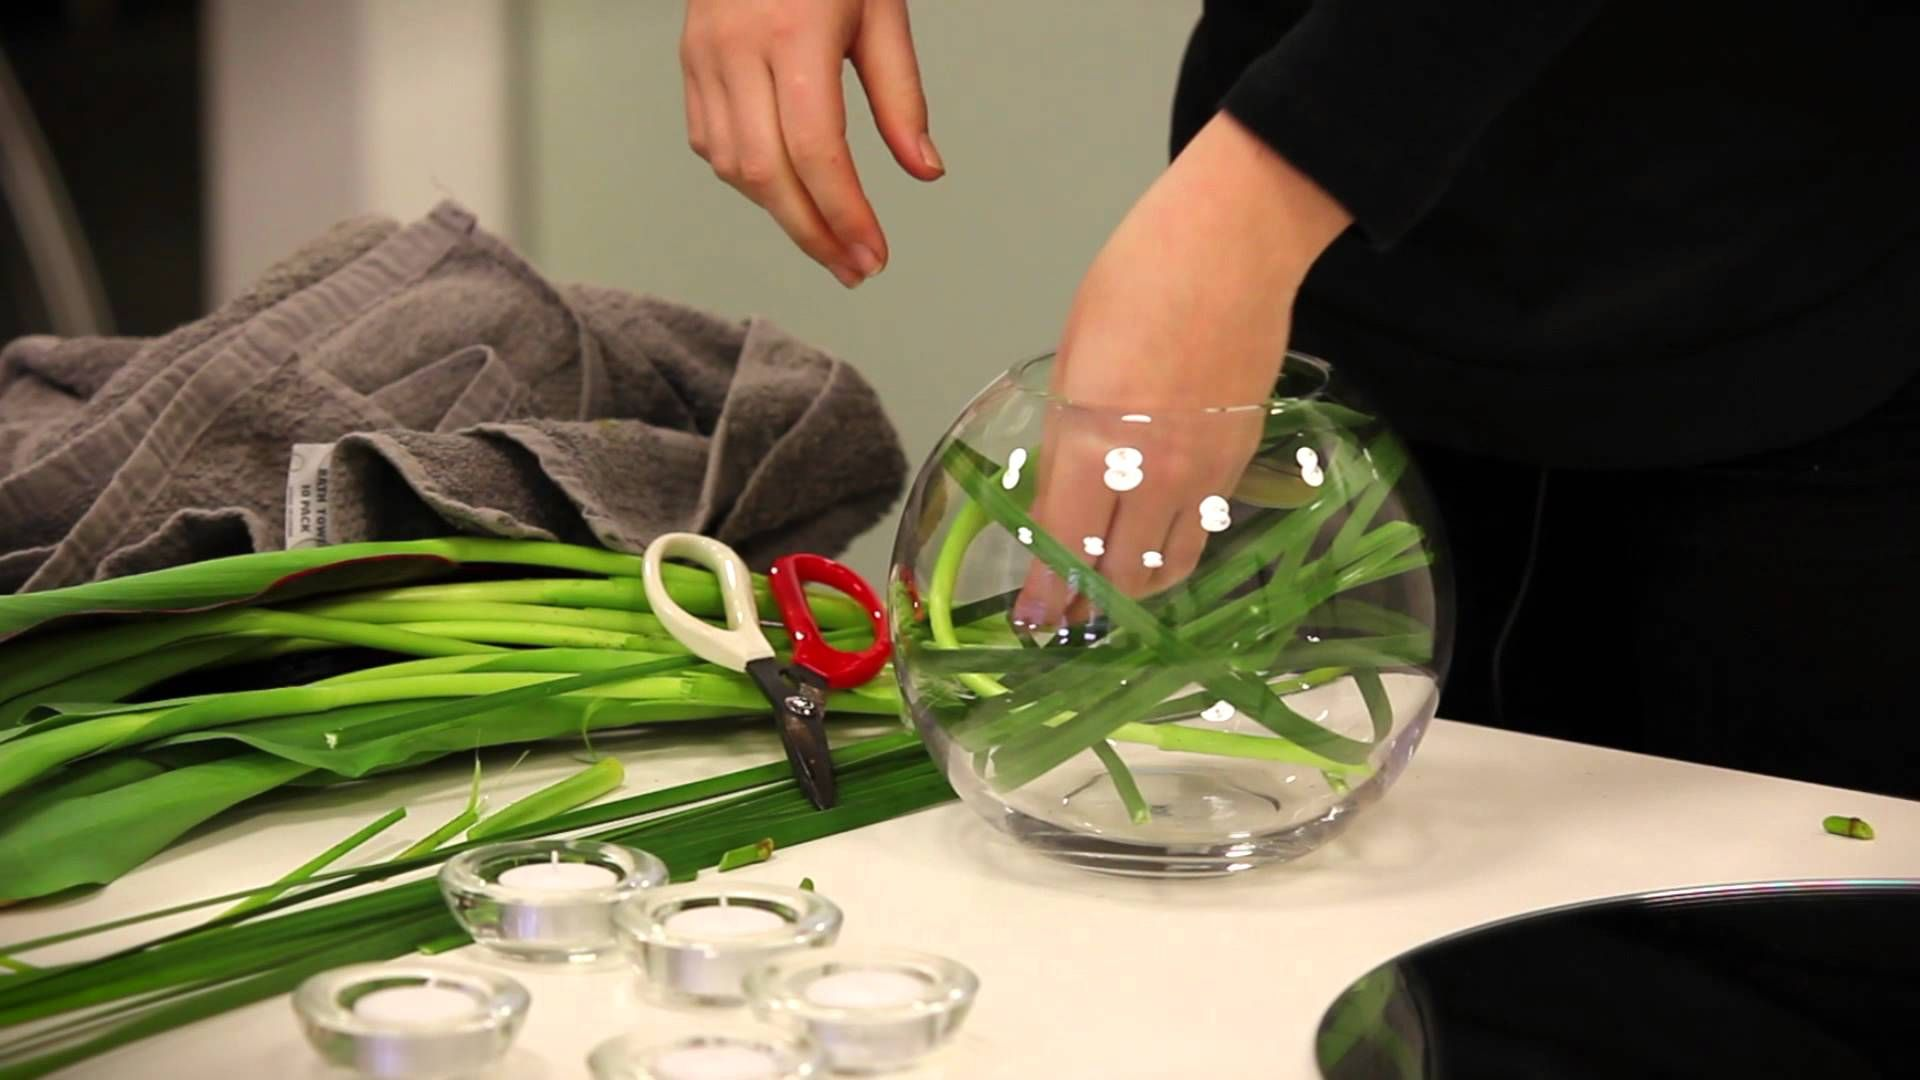 What To Put In A Bowl For Decoration Make An Instagramworthy Flower Arrangement  Flower Arrangements